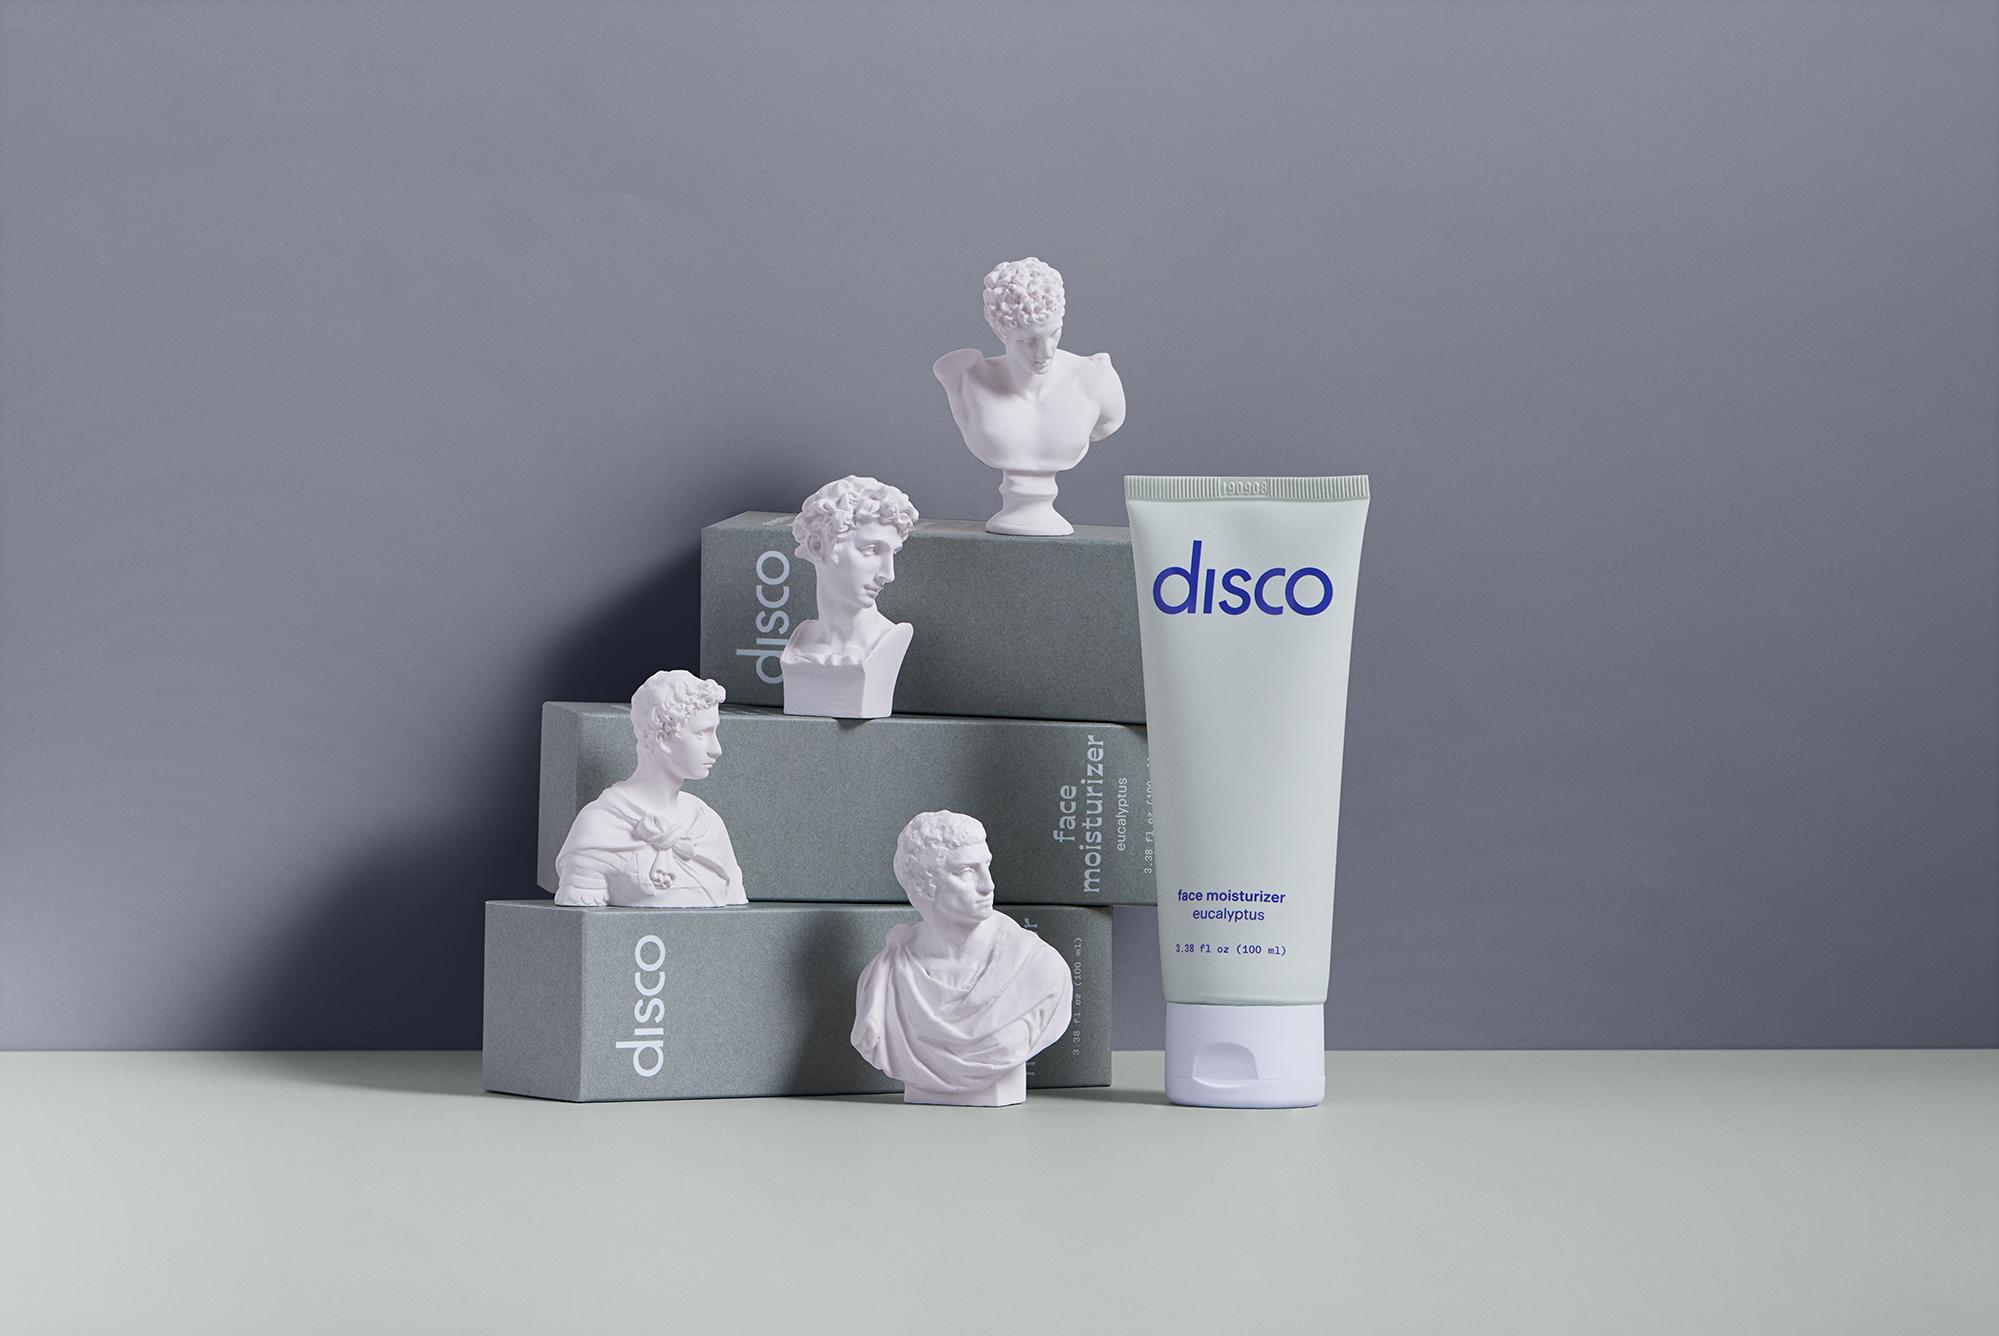 Disco-product12362